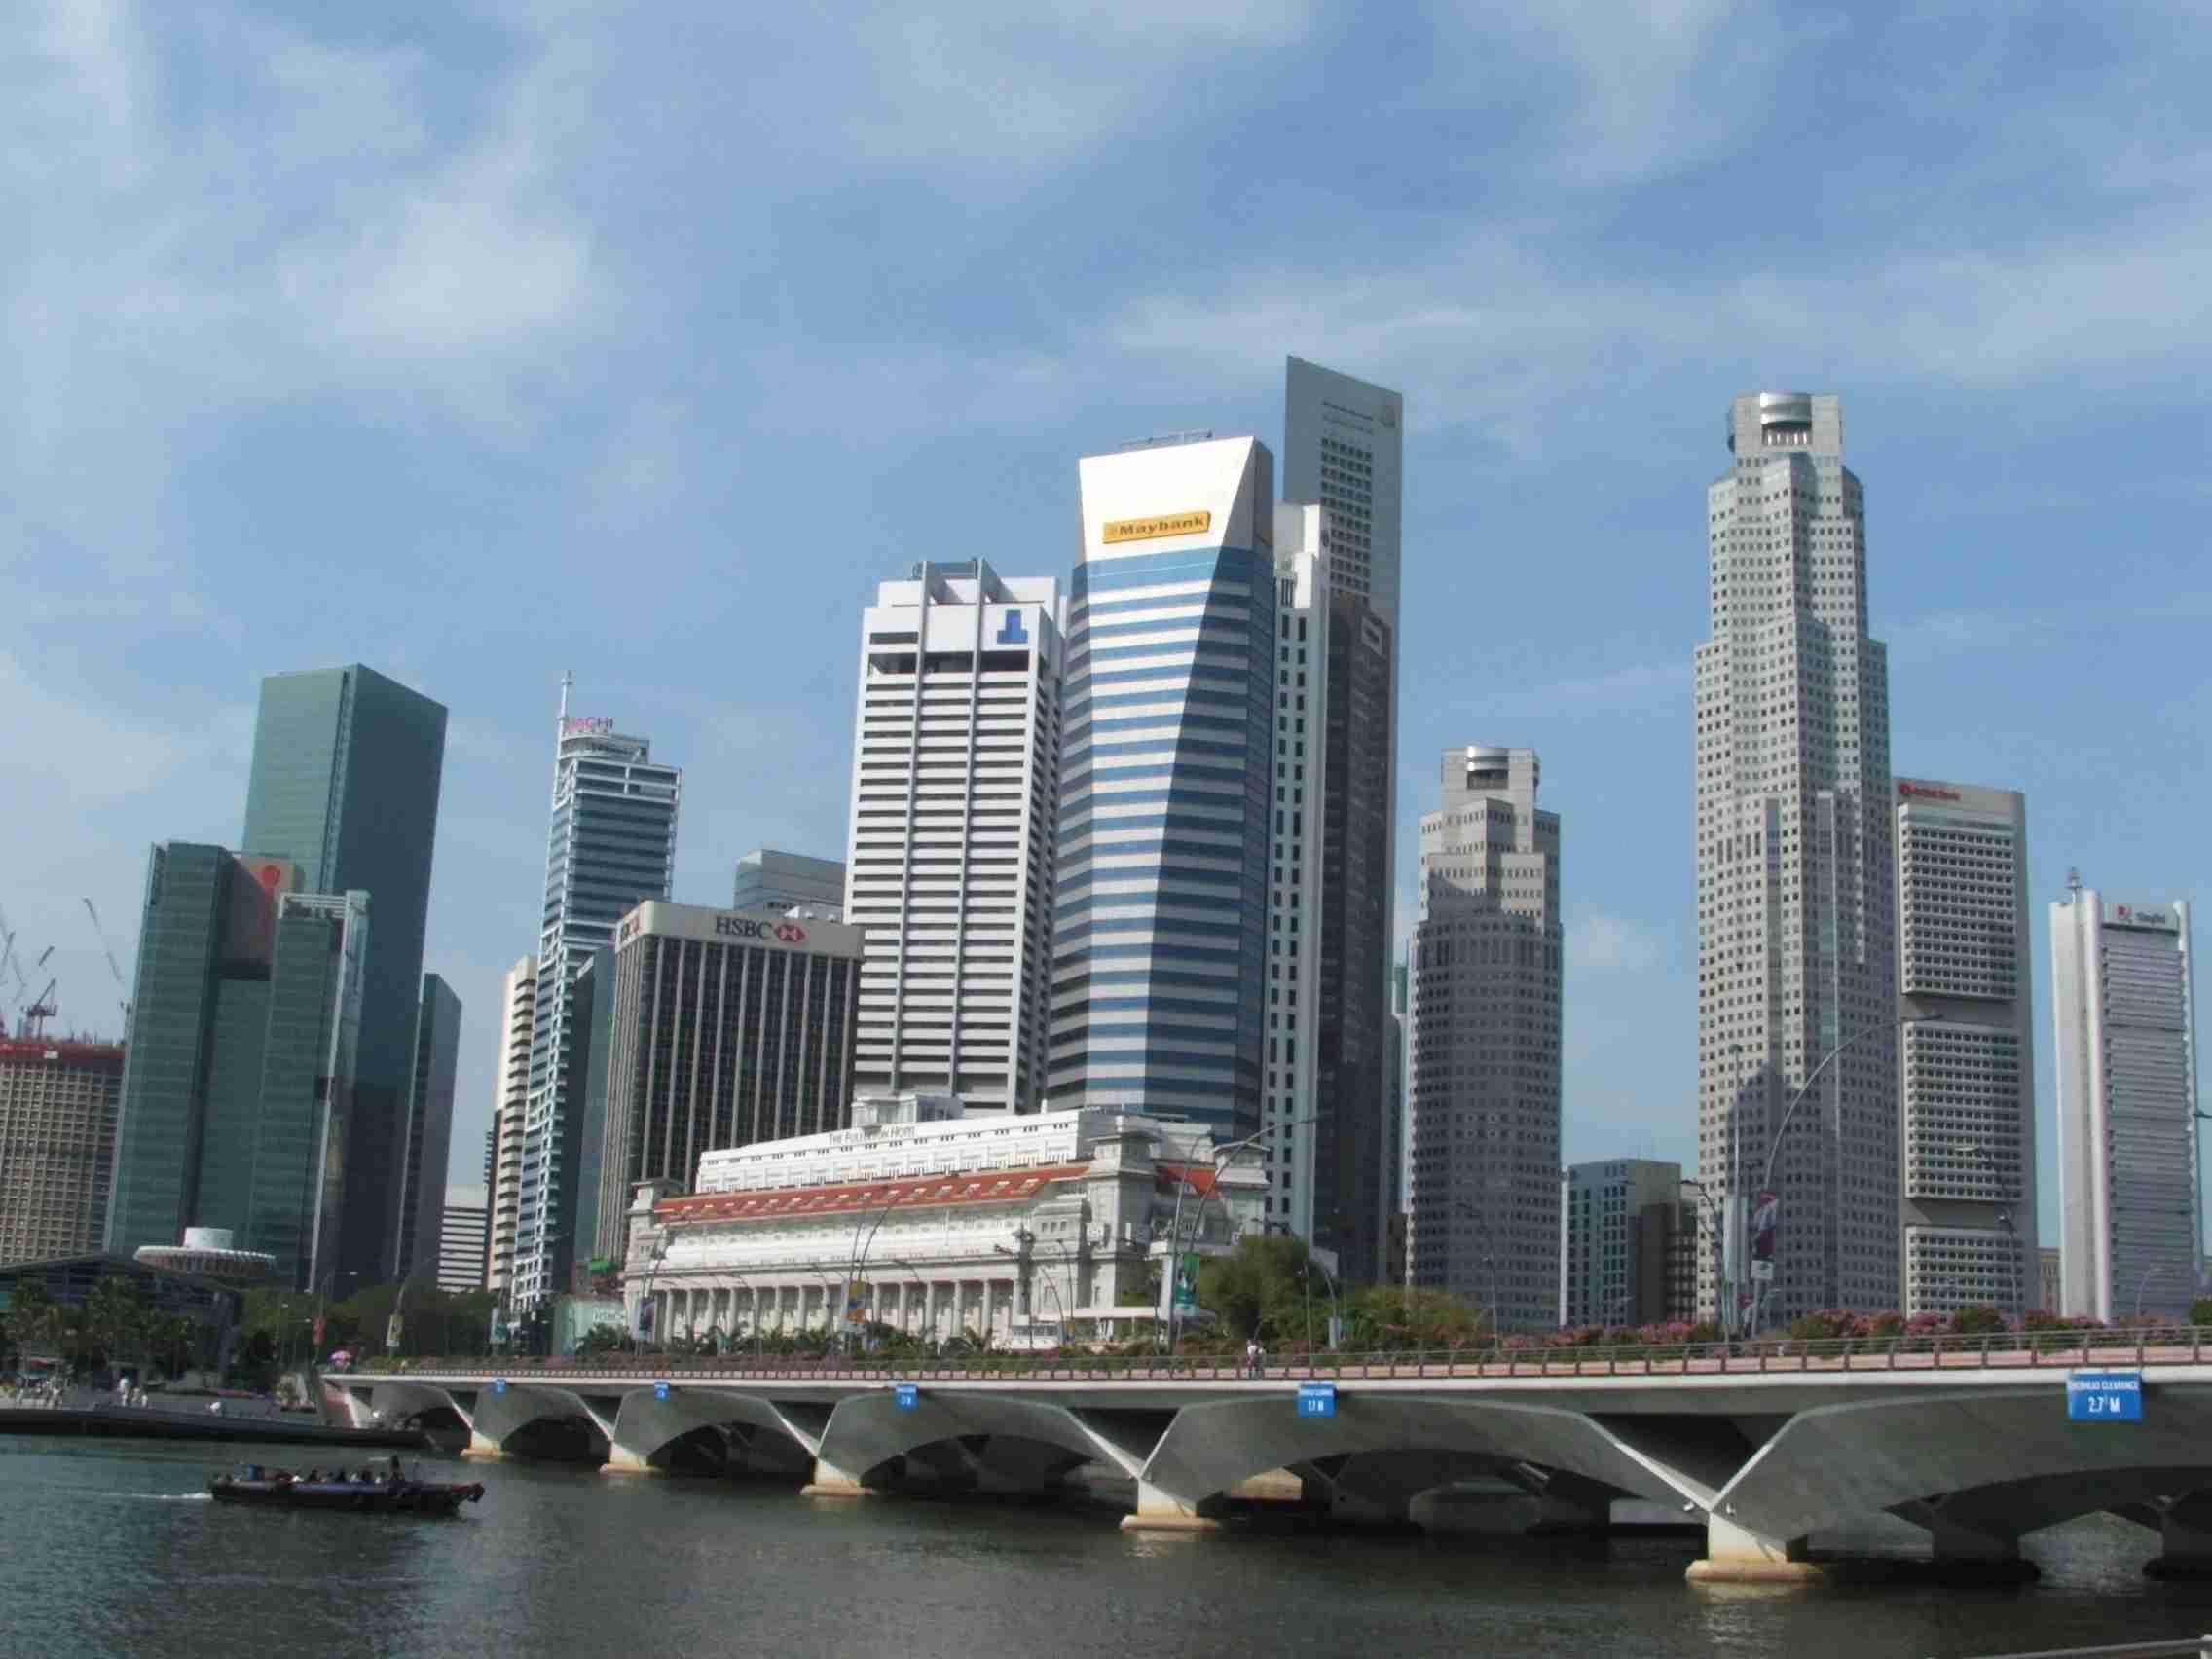 Singapore. Photo: Elen Turner